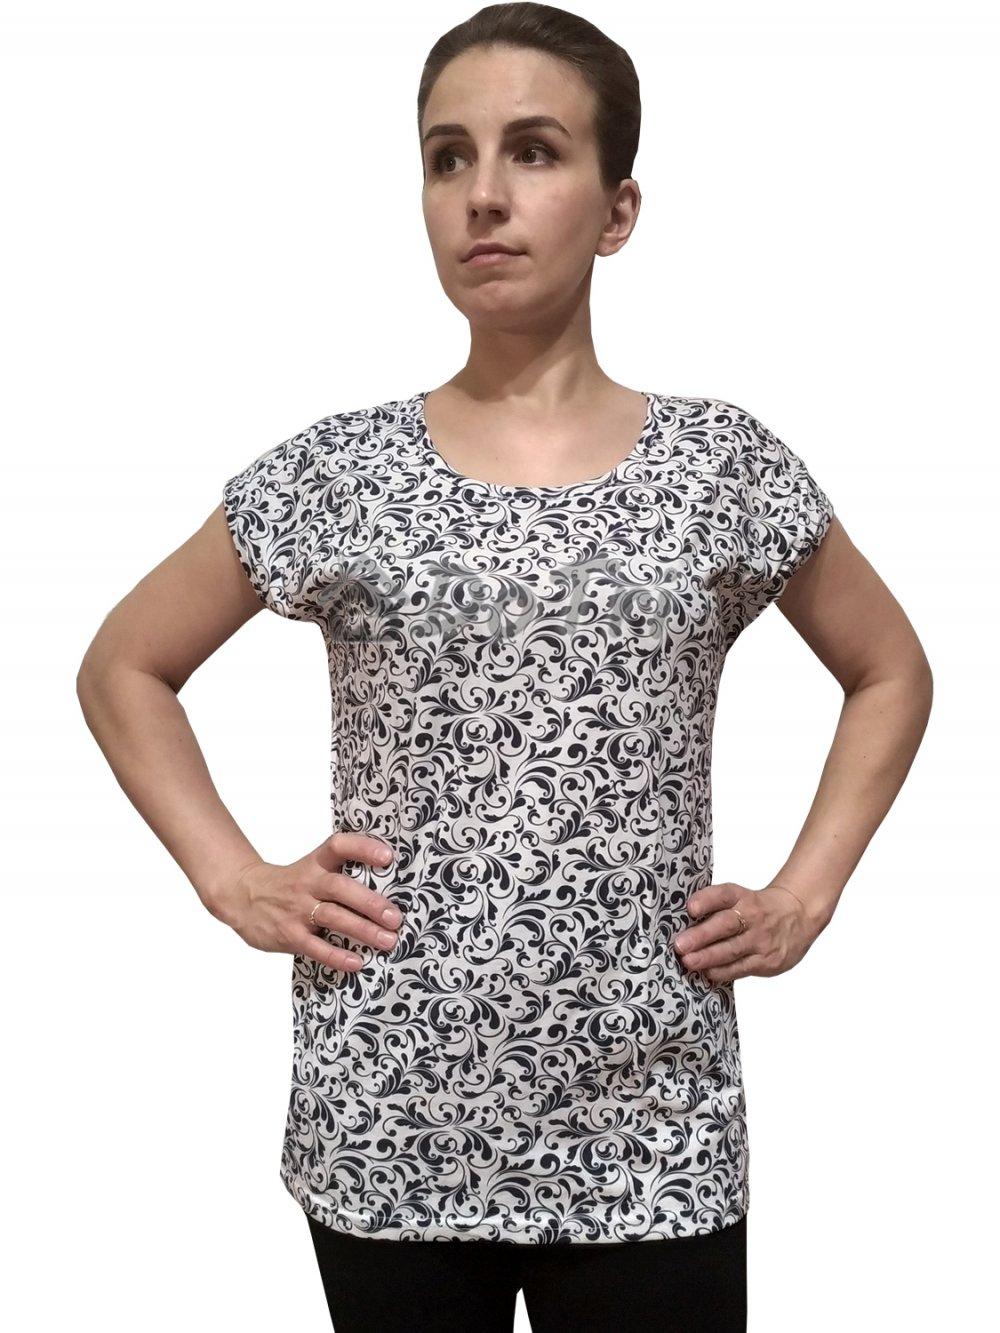 Увеличить - Блуза «Прима» (синие лепестки)